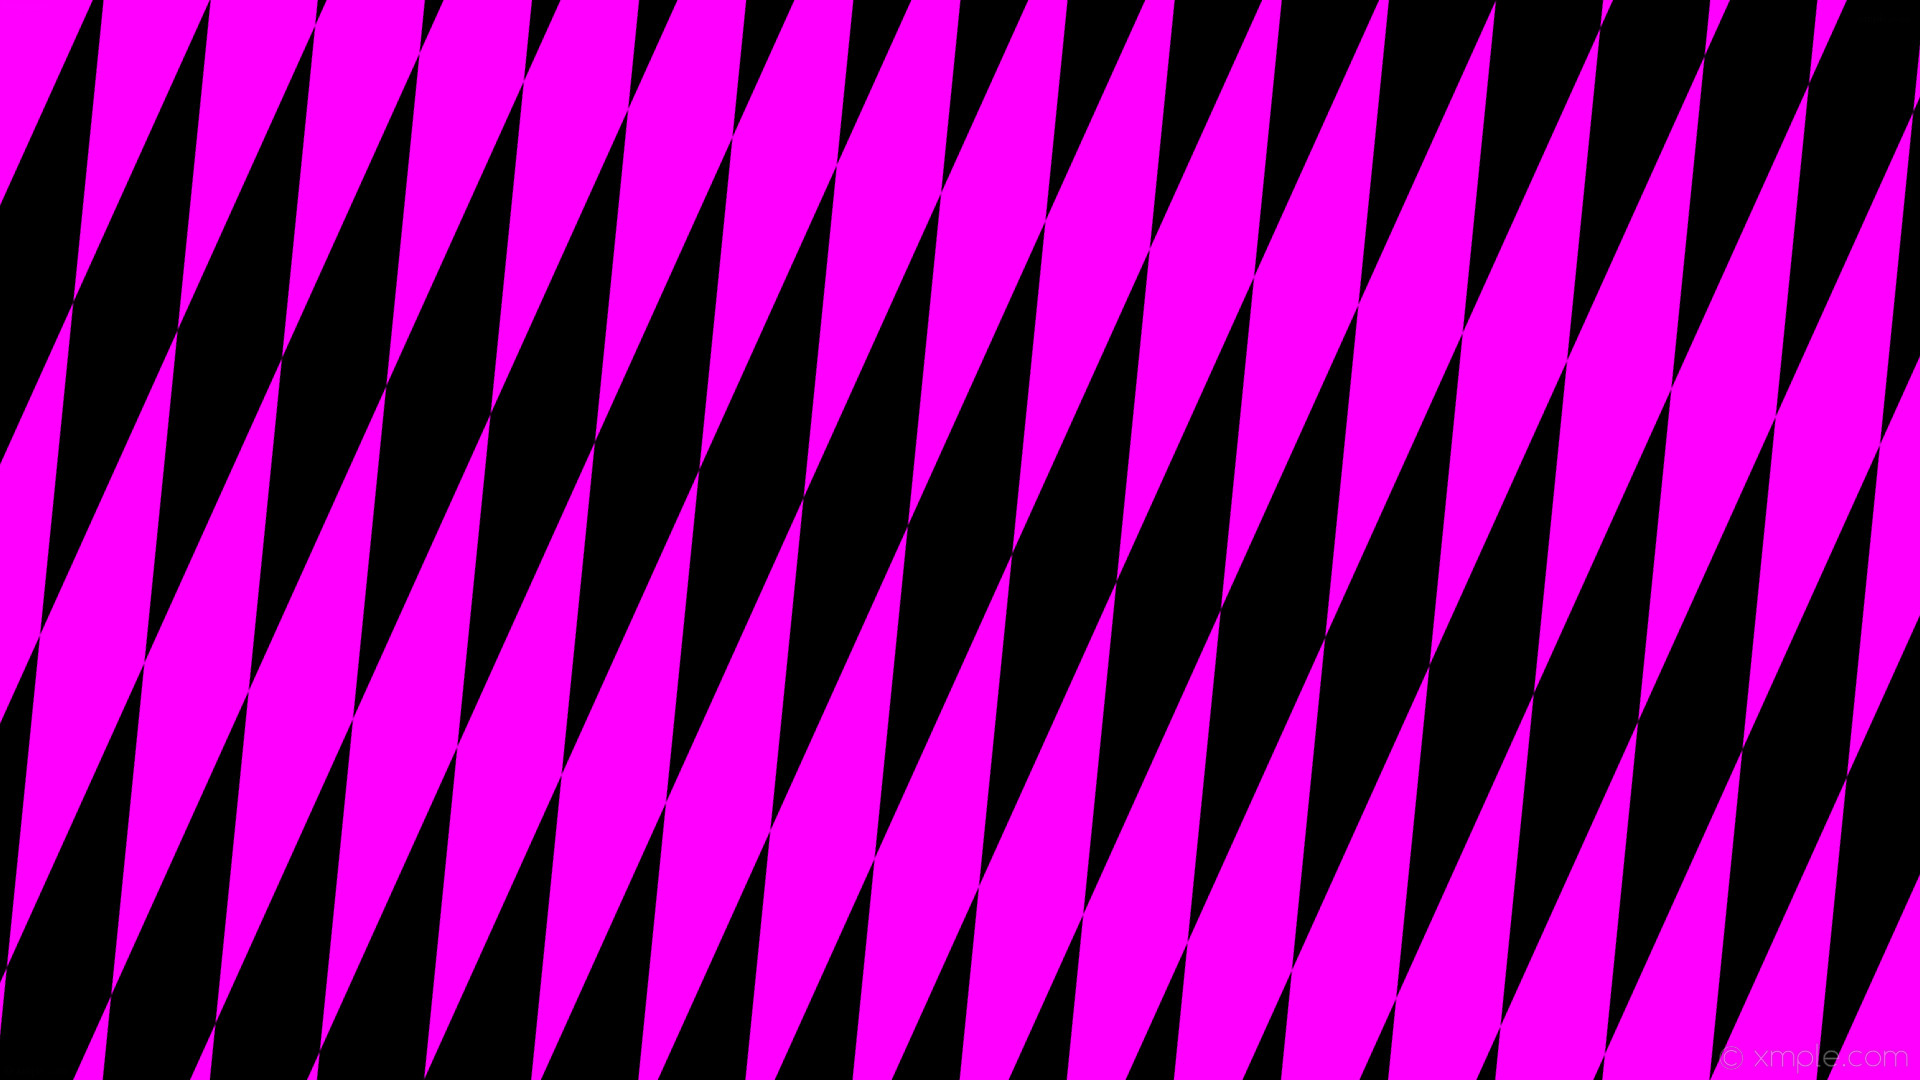 wallpaper rhombus black lozenge purple diamond magenta #000000 #ff00ff 75°  660px 108px